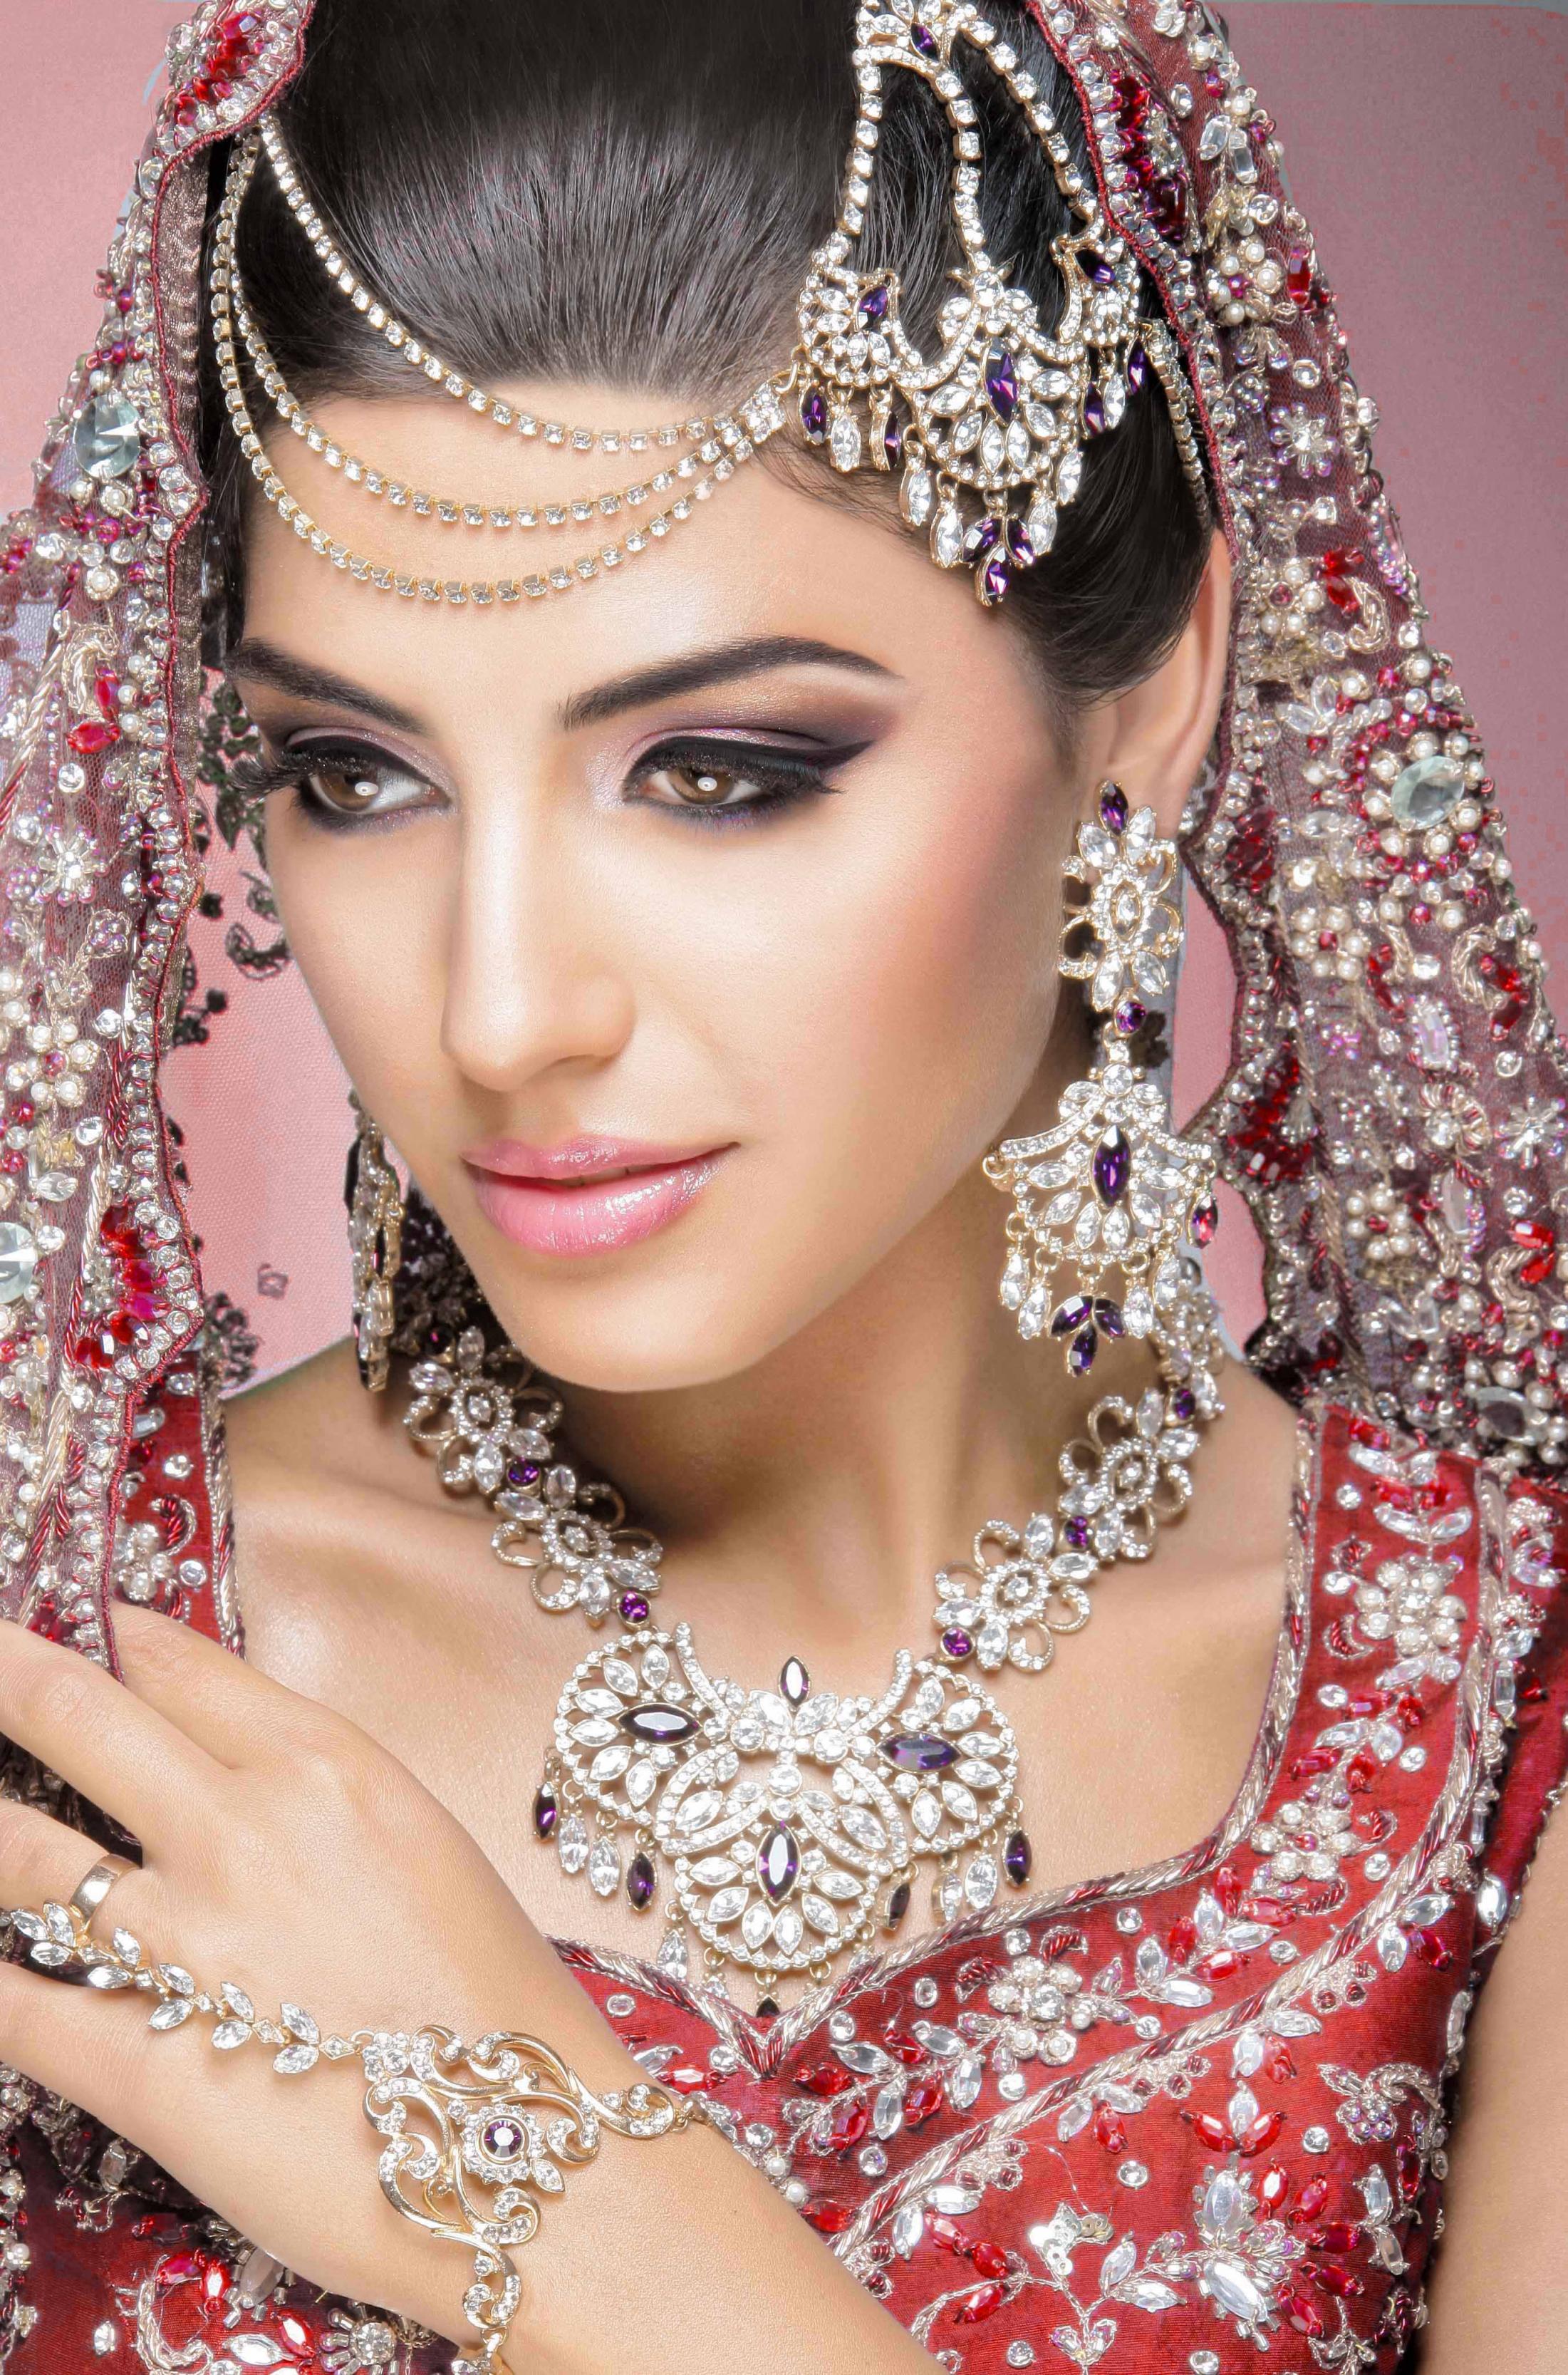 صورة اجمل الهنديات , اروع صور بنات هنديات جميلات 4422 3